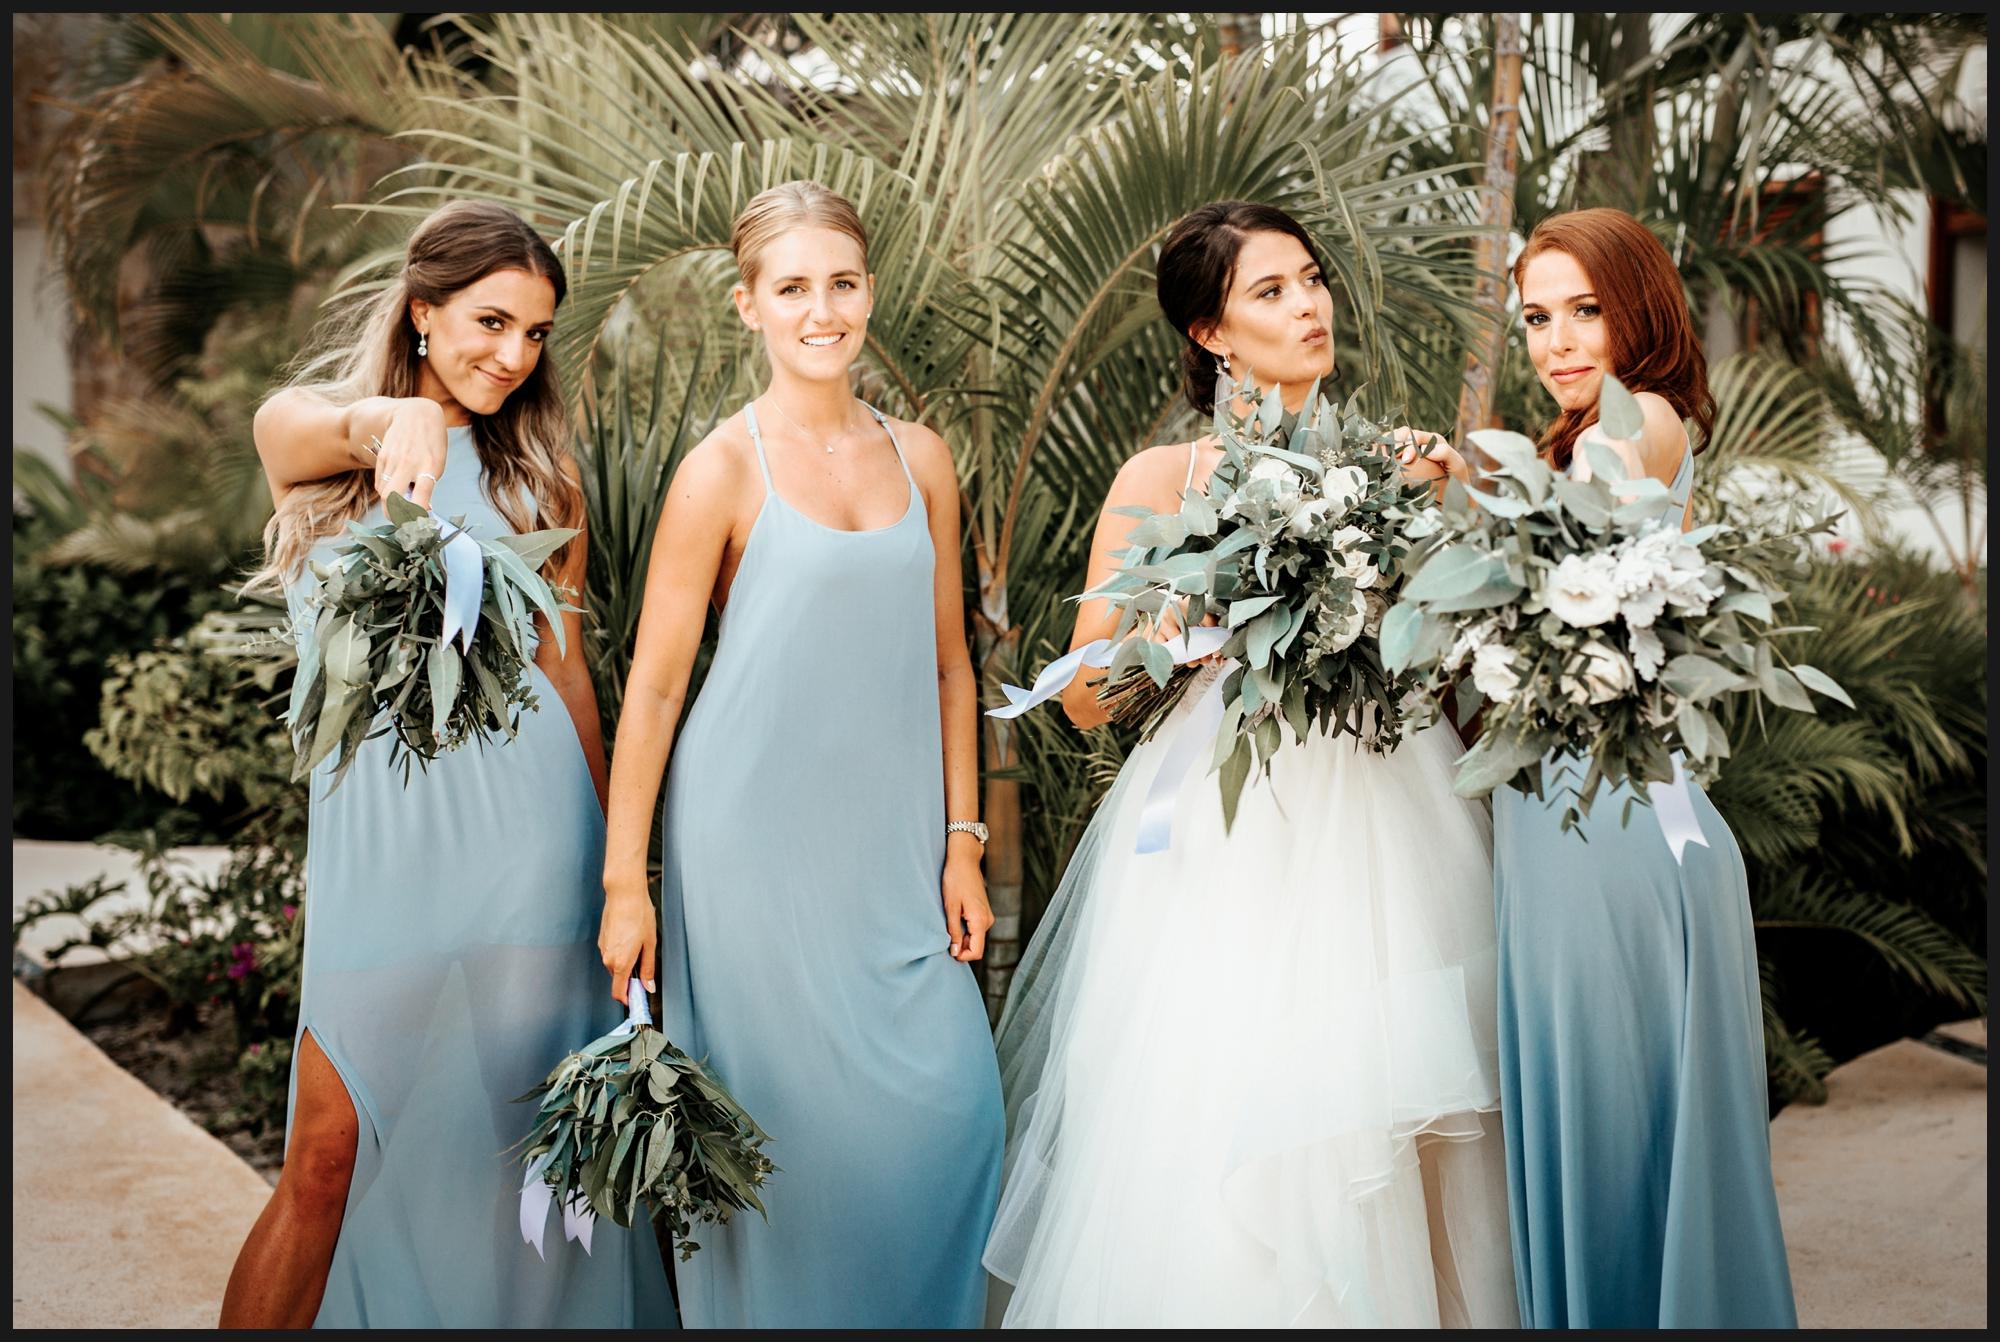 Orlando-Wedding-Photographer-destination-wedding-photographer-florida-wedding-photographer-bohemian-wedding-photographer_0514.jpg